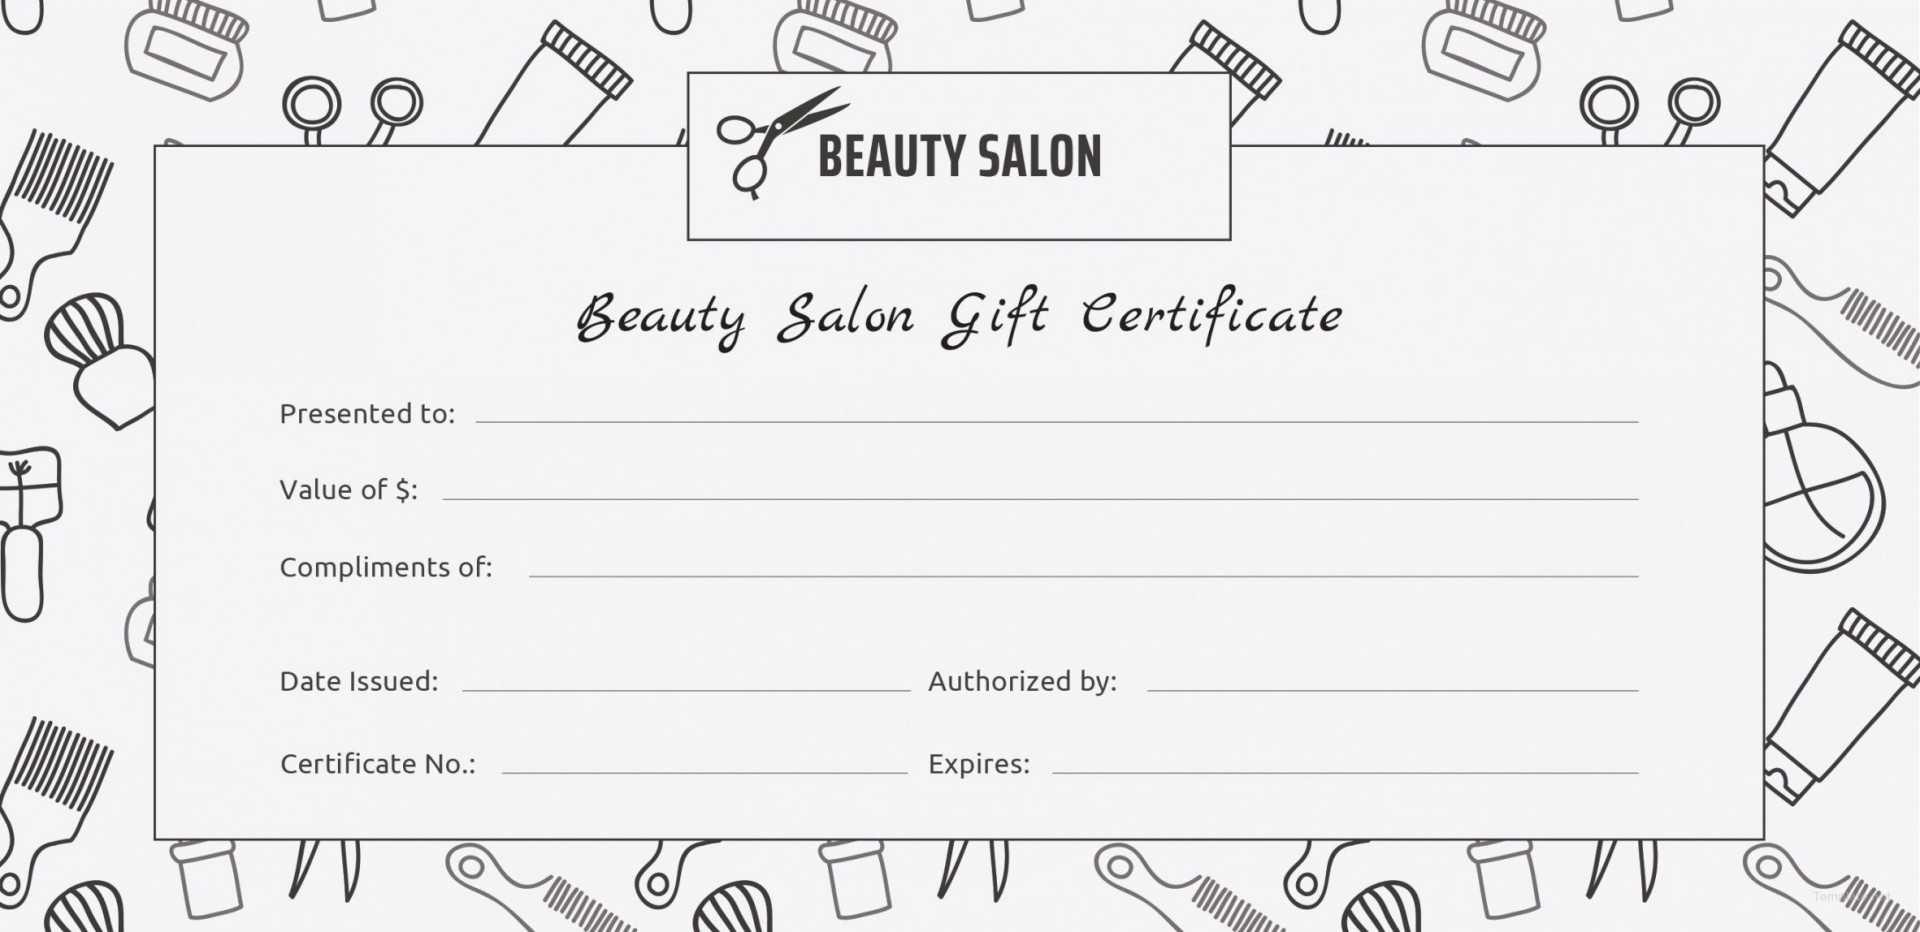 001 Salon Gift Certificate Templates Free Printable Hair With Salon Gift Certificate Template